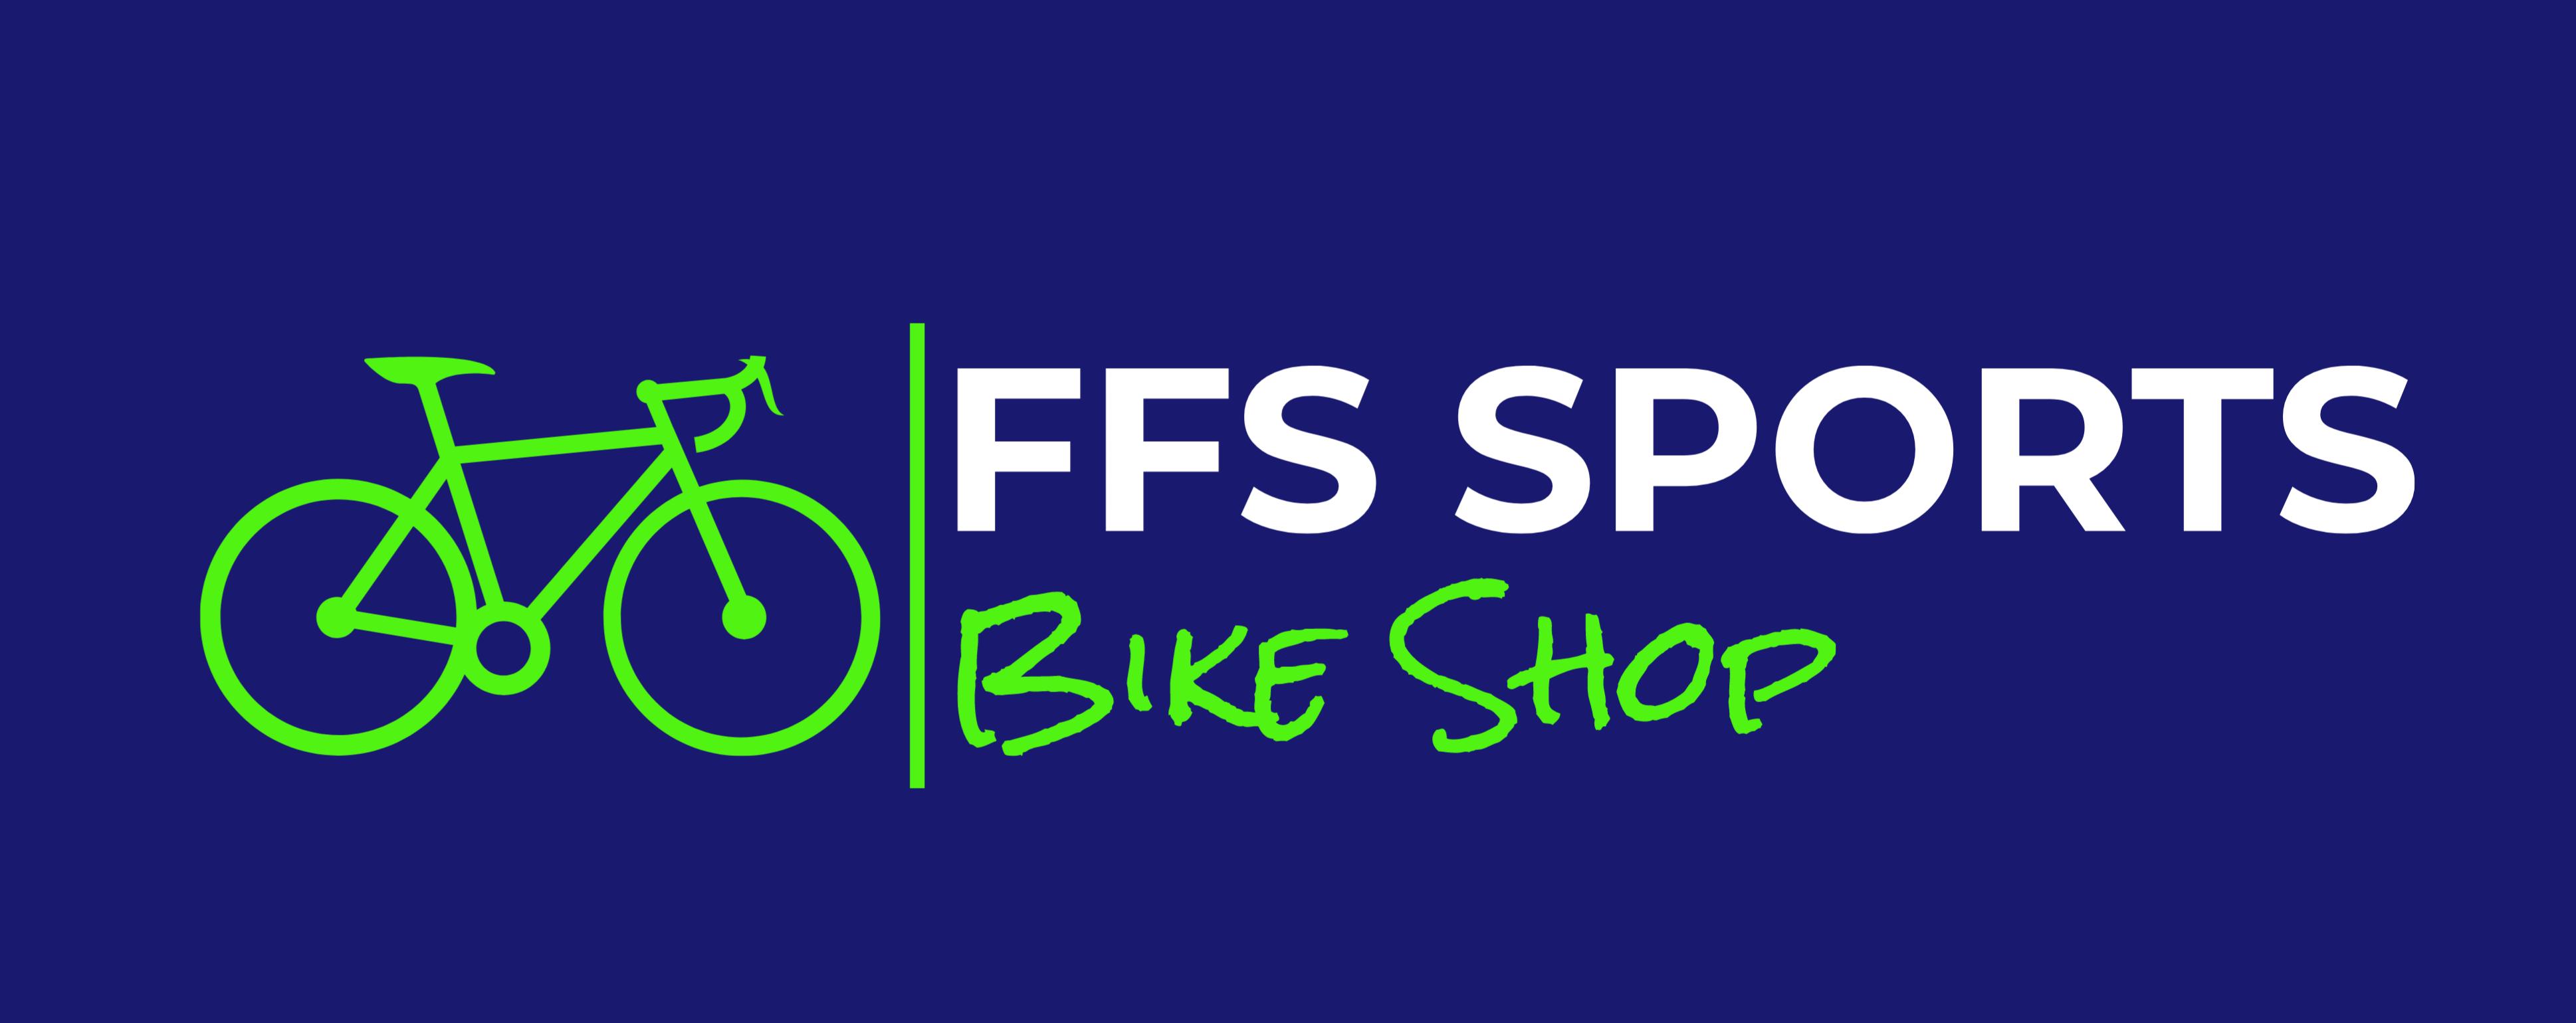 FFS SPORTS